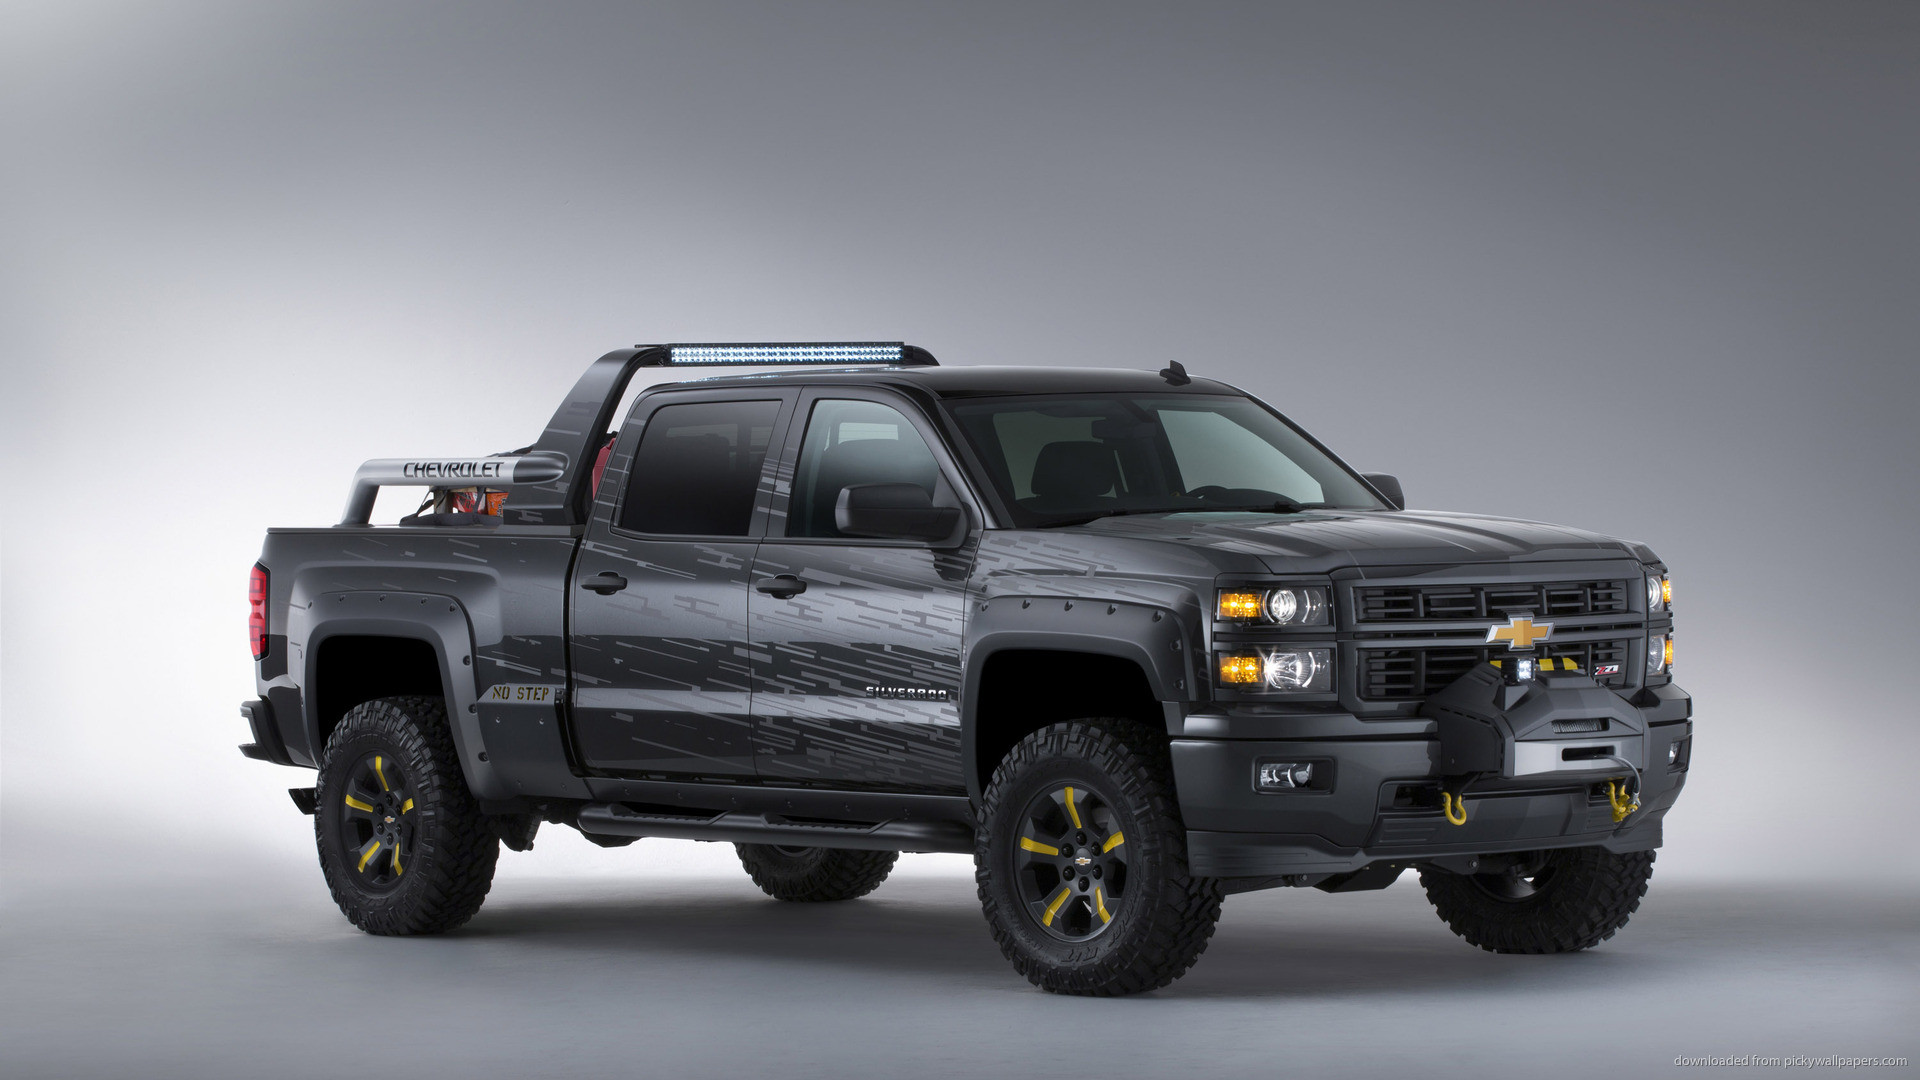 Chevrolet Silverado Black Ops Concept picture